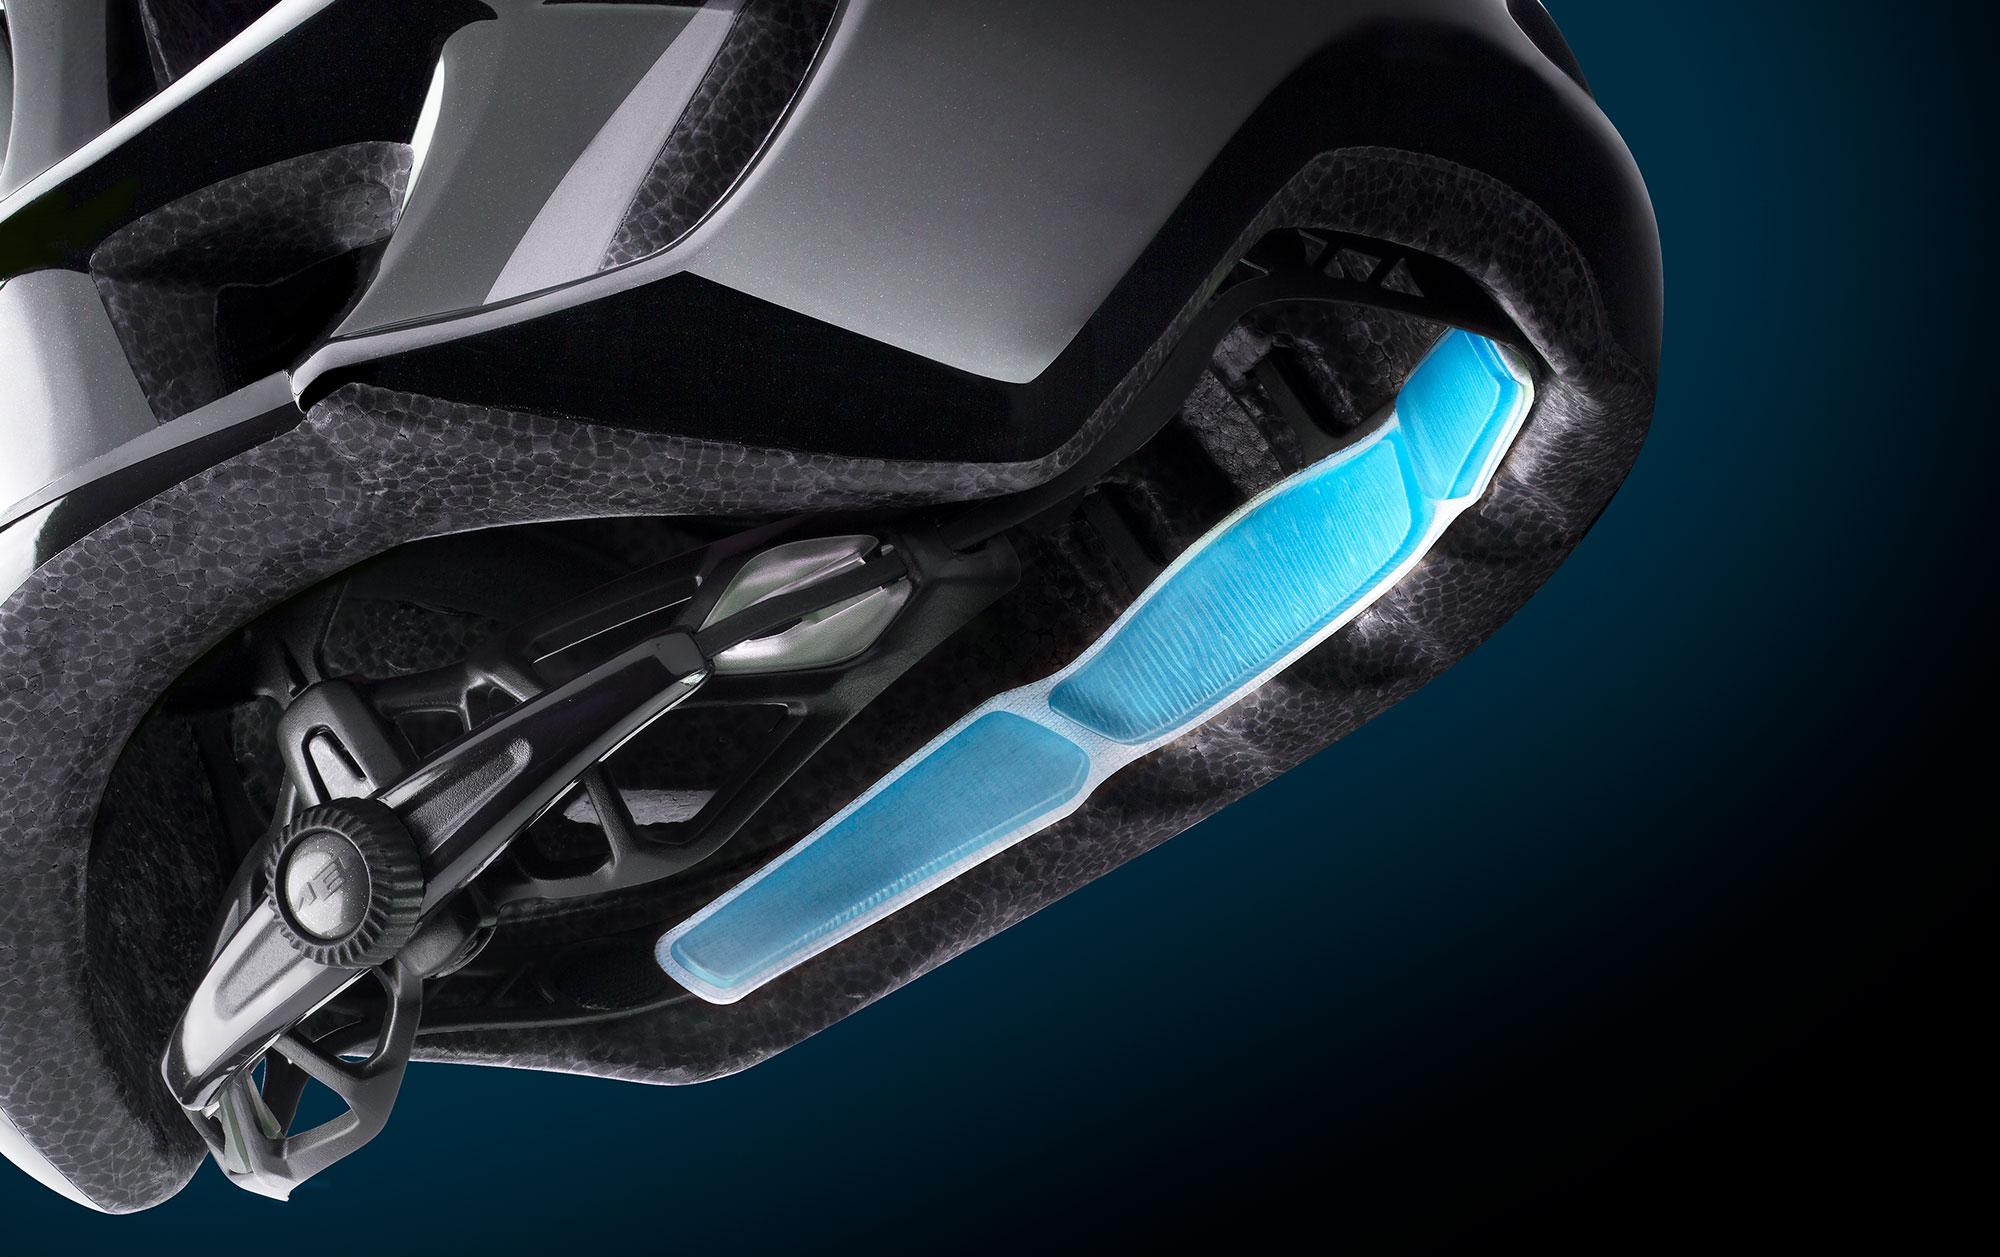 MET Manta Road, Aero and Cyclocross Helmet Retention System